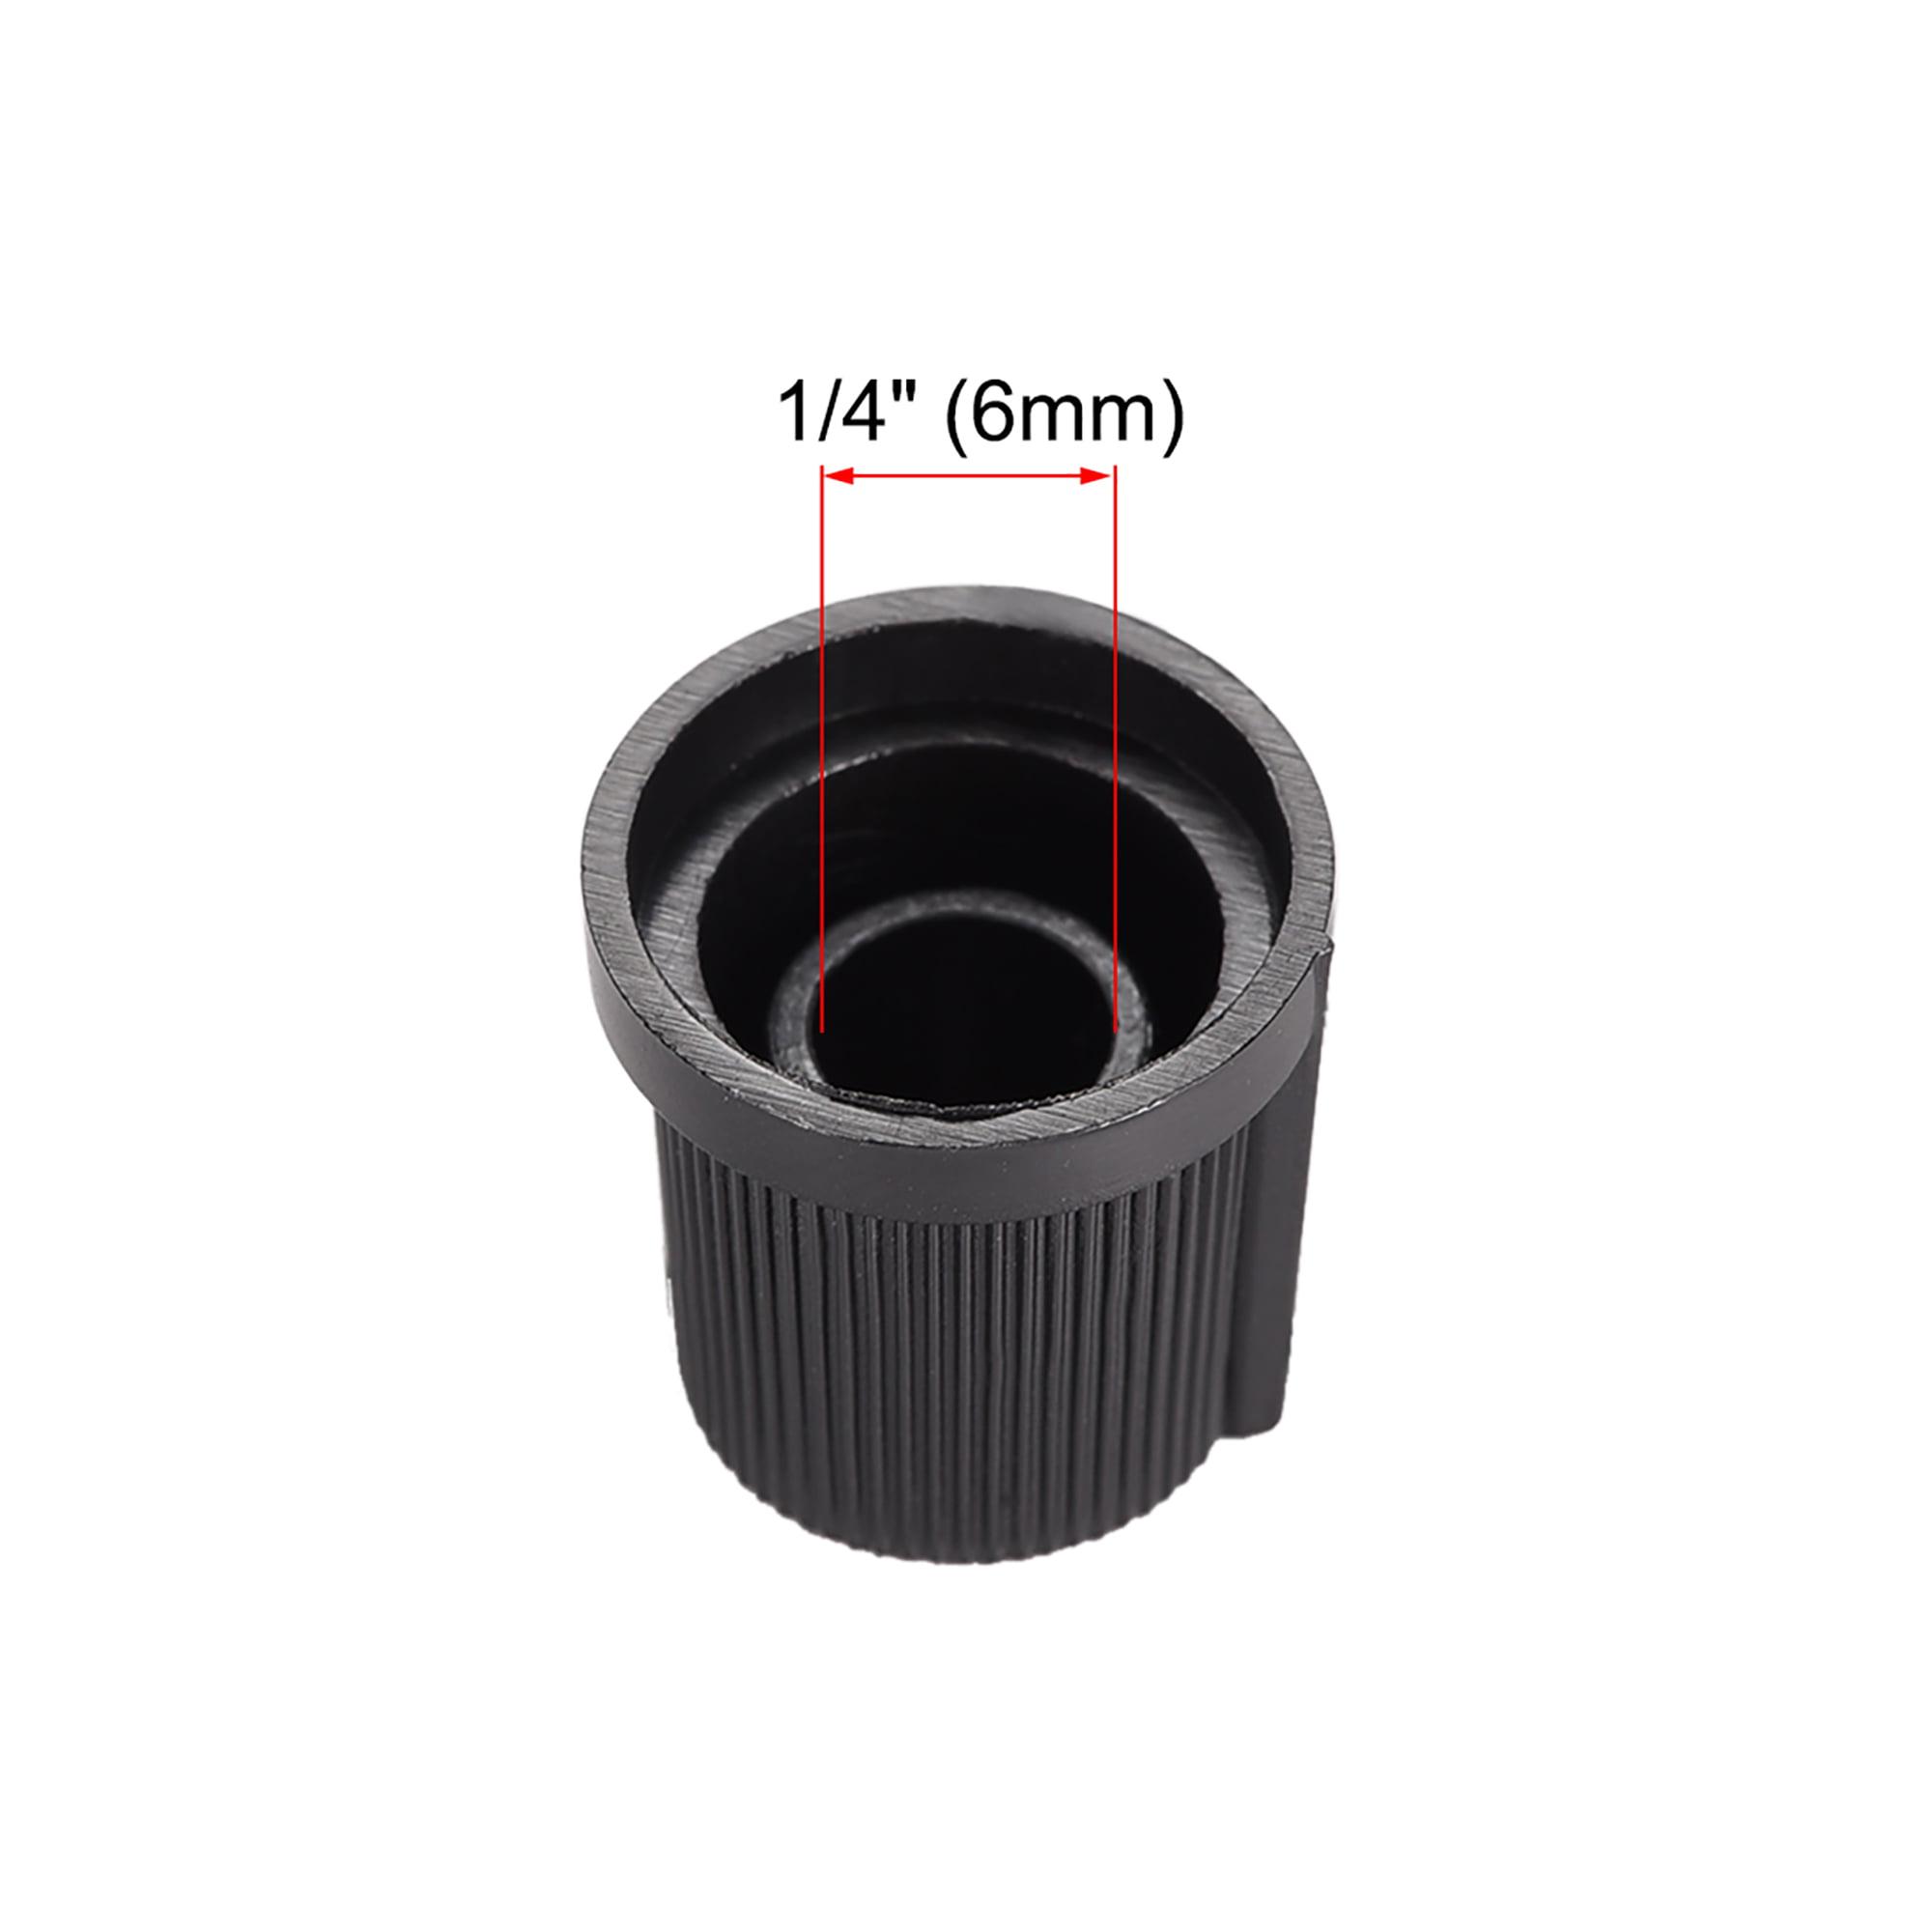 10Pcs 6mm Knob for Effect Pedal Amplifier Black Potentiometer Knob White Mark